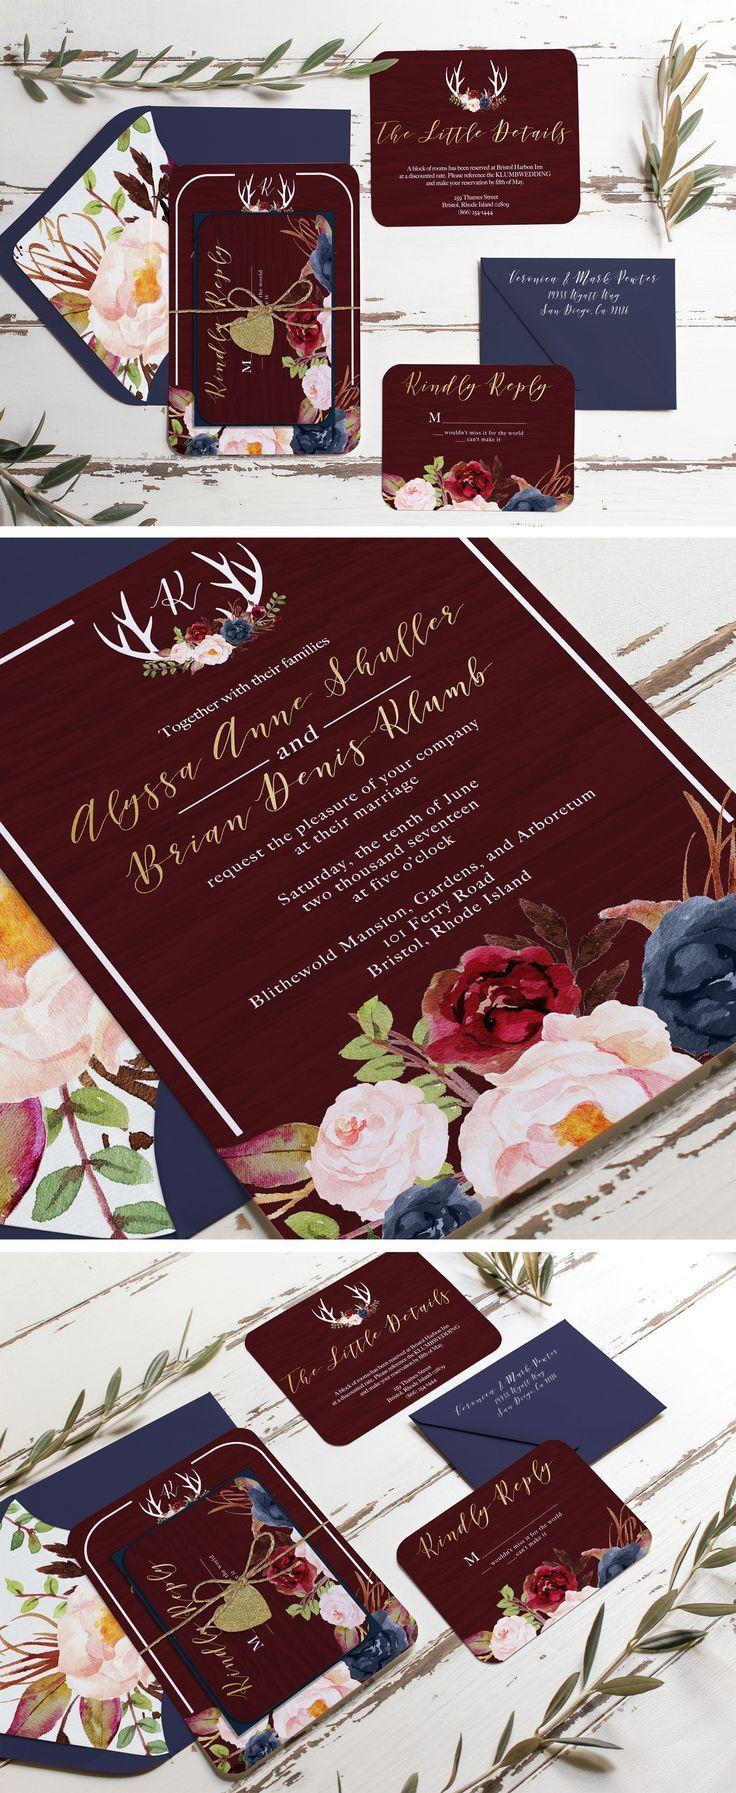 Marsala burgundy gold and navy rustic wedding invitation. Unica Forma makes custom invitations like this wood grain fall invitation. Blush merlot blue wedding invitation envelope liners and floral print!